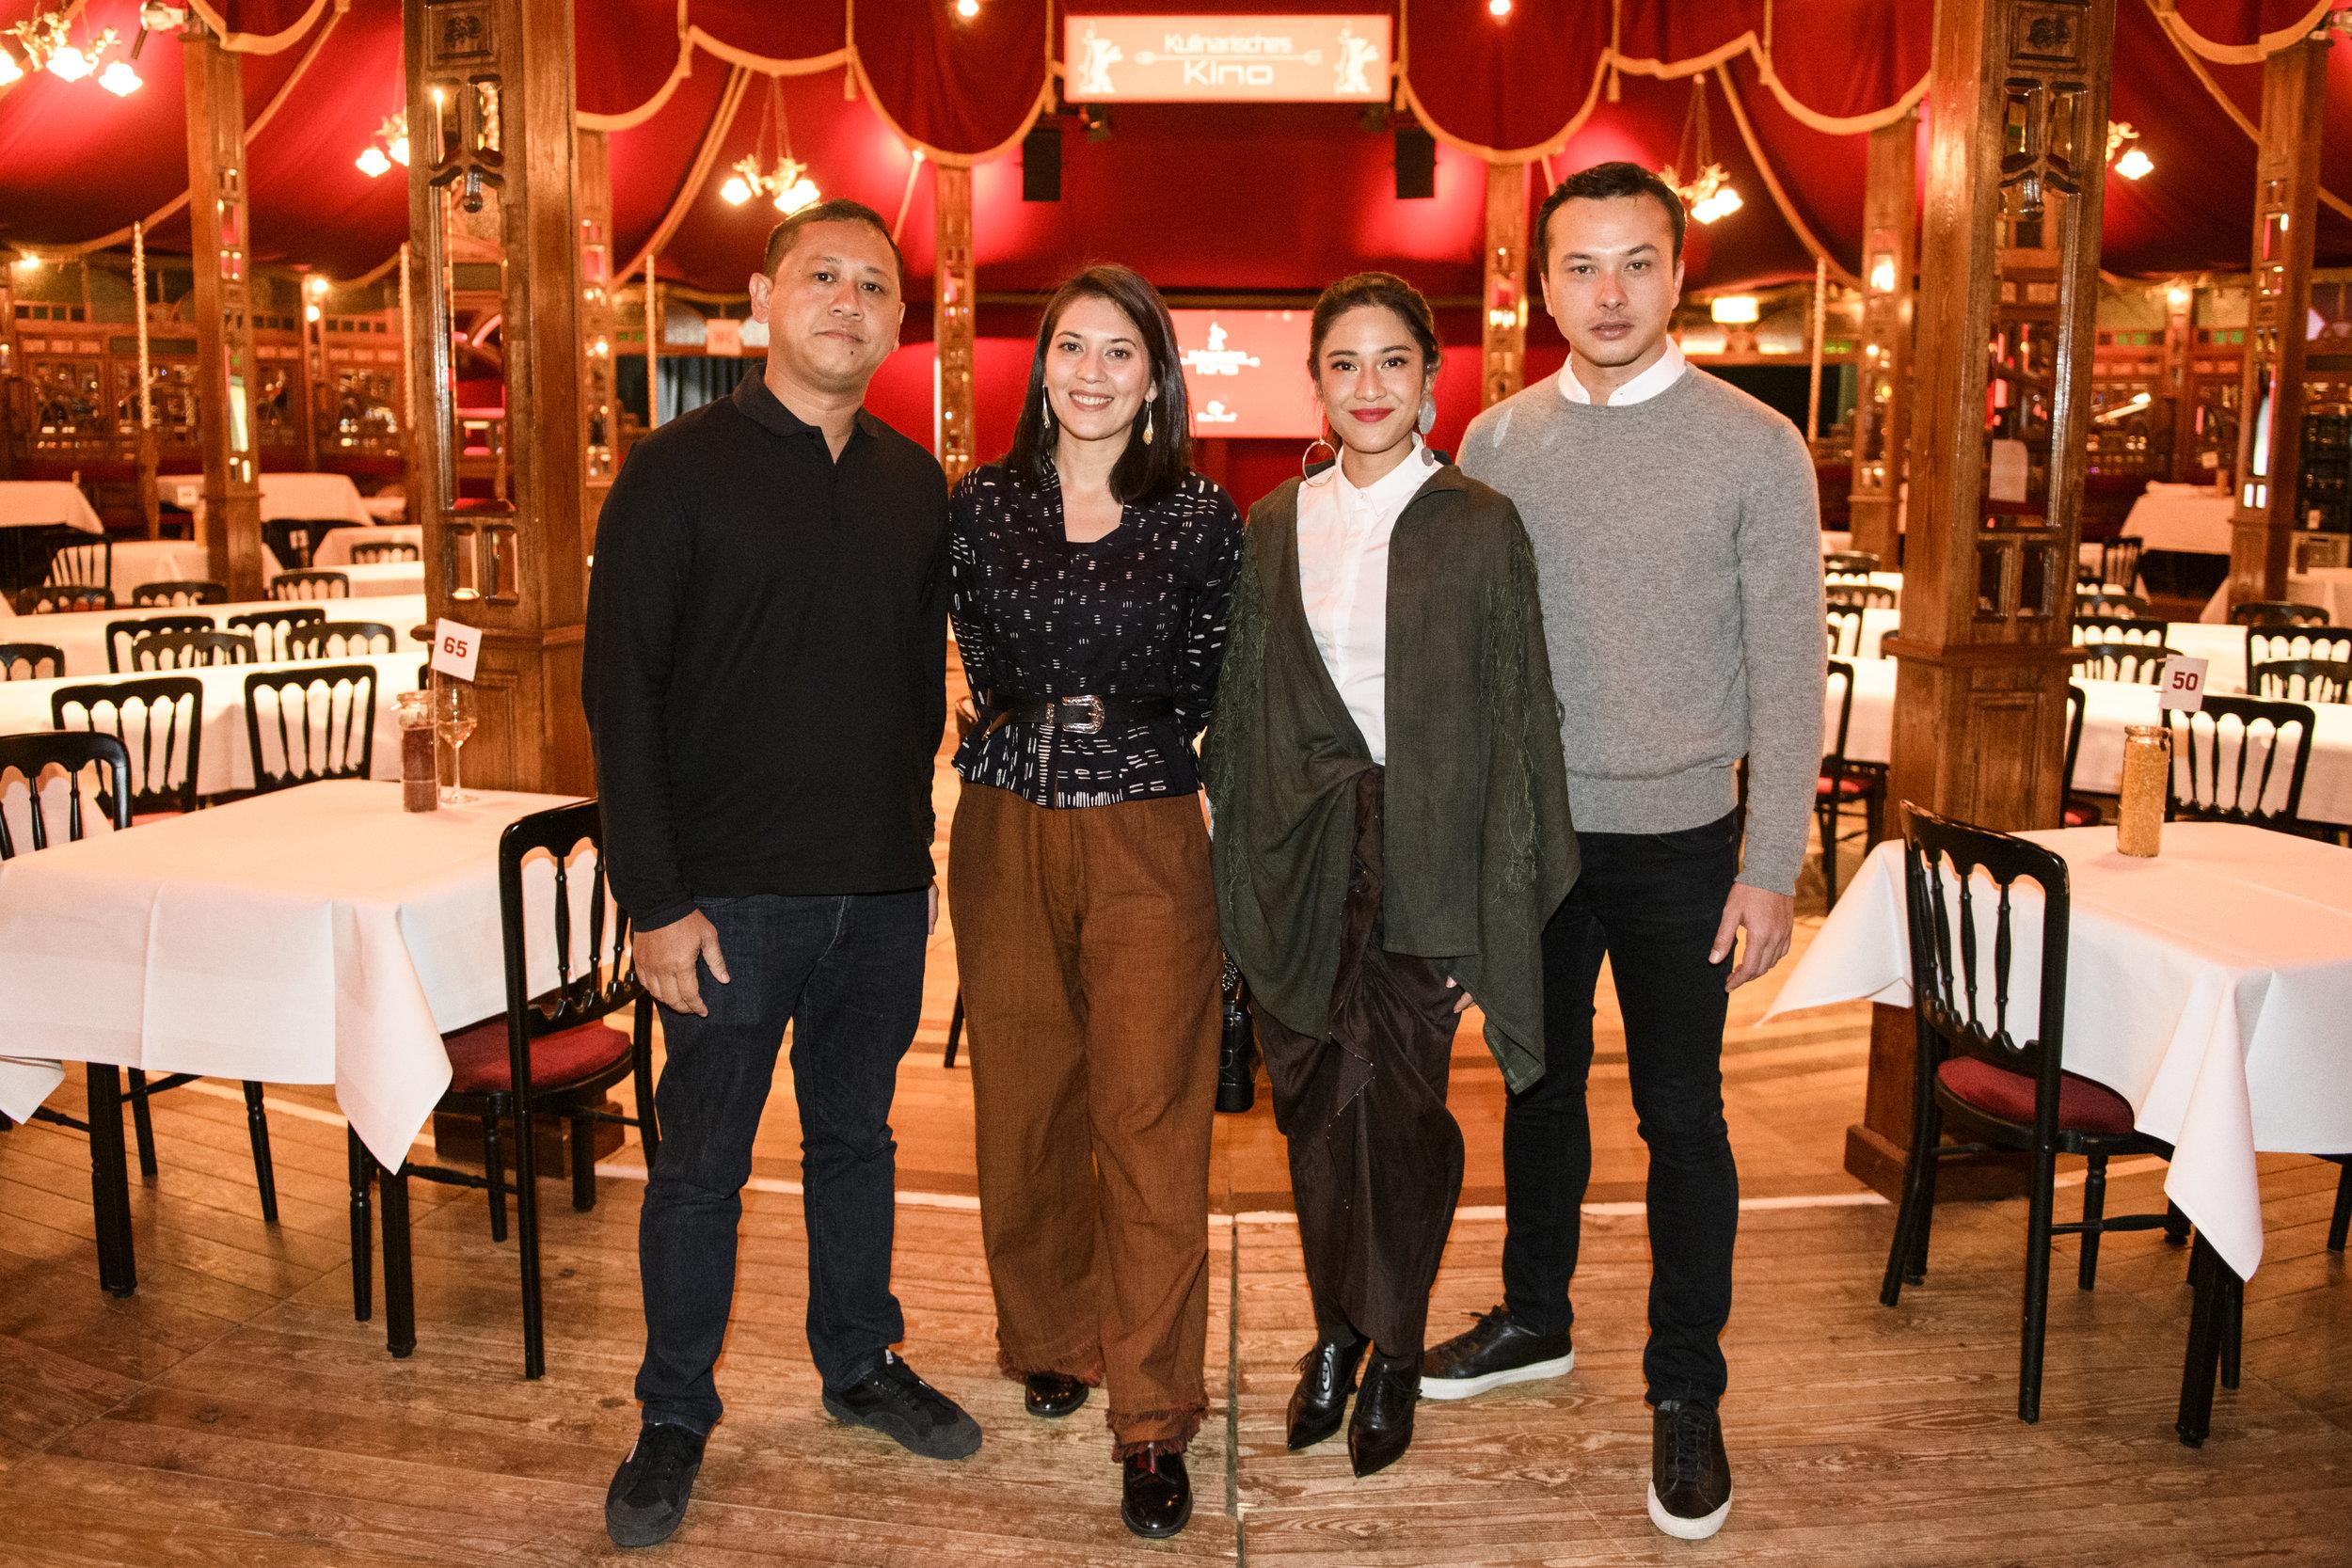 Edwin, Hannah Al Rashid, Dian Sastrowardoyo and Nicholas Saputra (left to right) at the pop-up restaurant. Photo courtesy of Berlinale/ Piero Chiusi